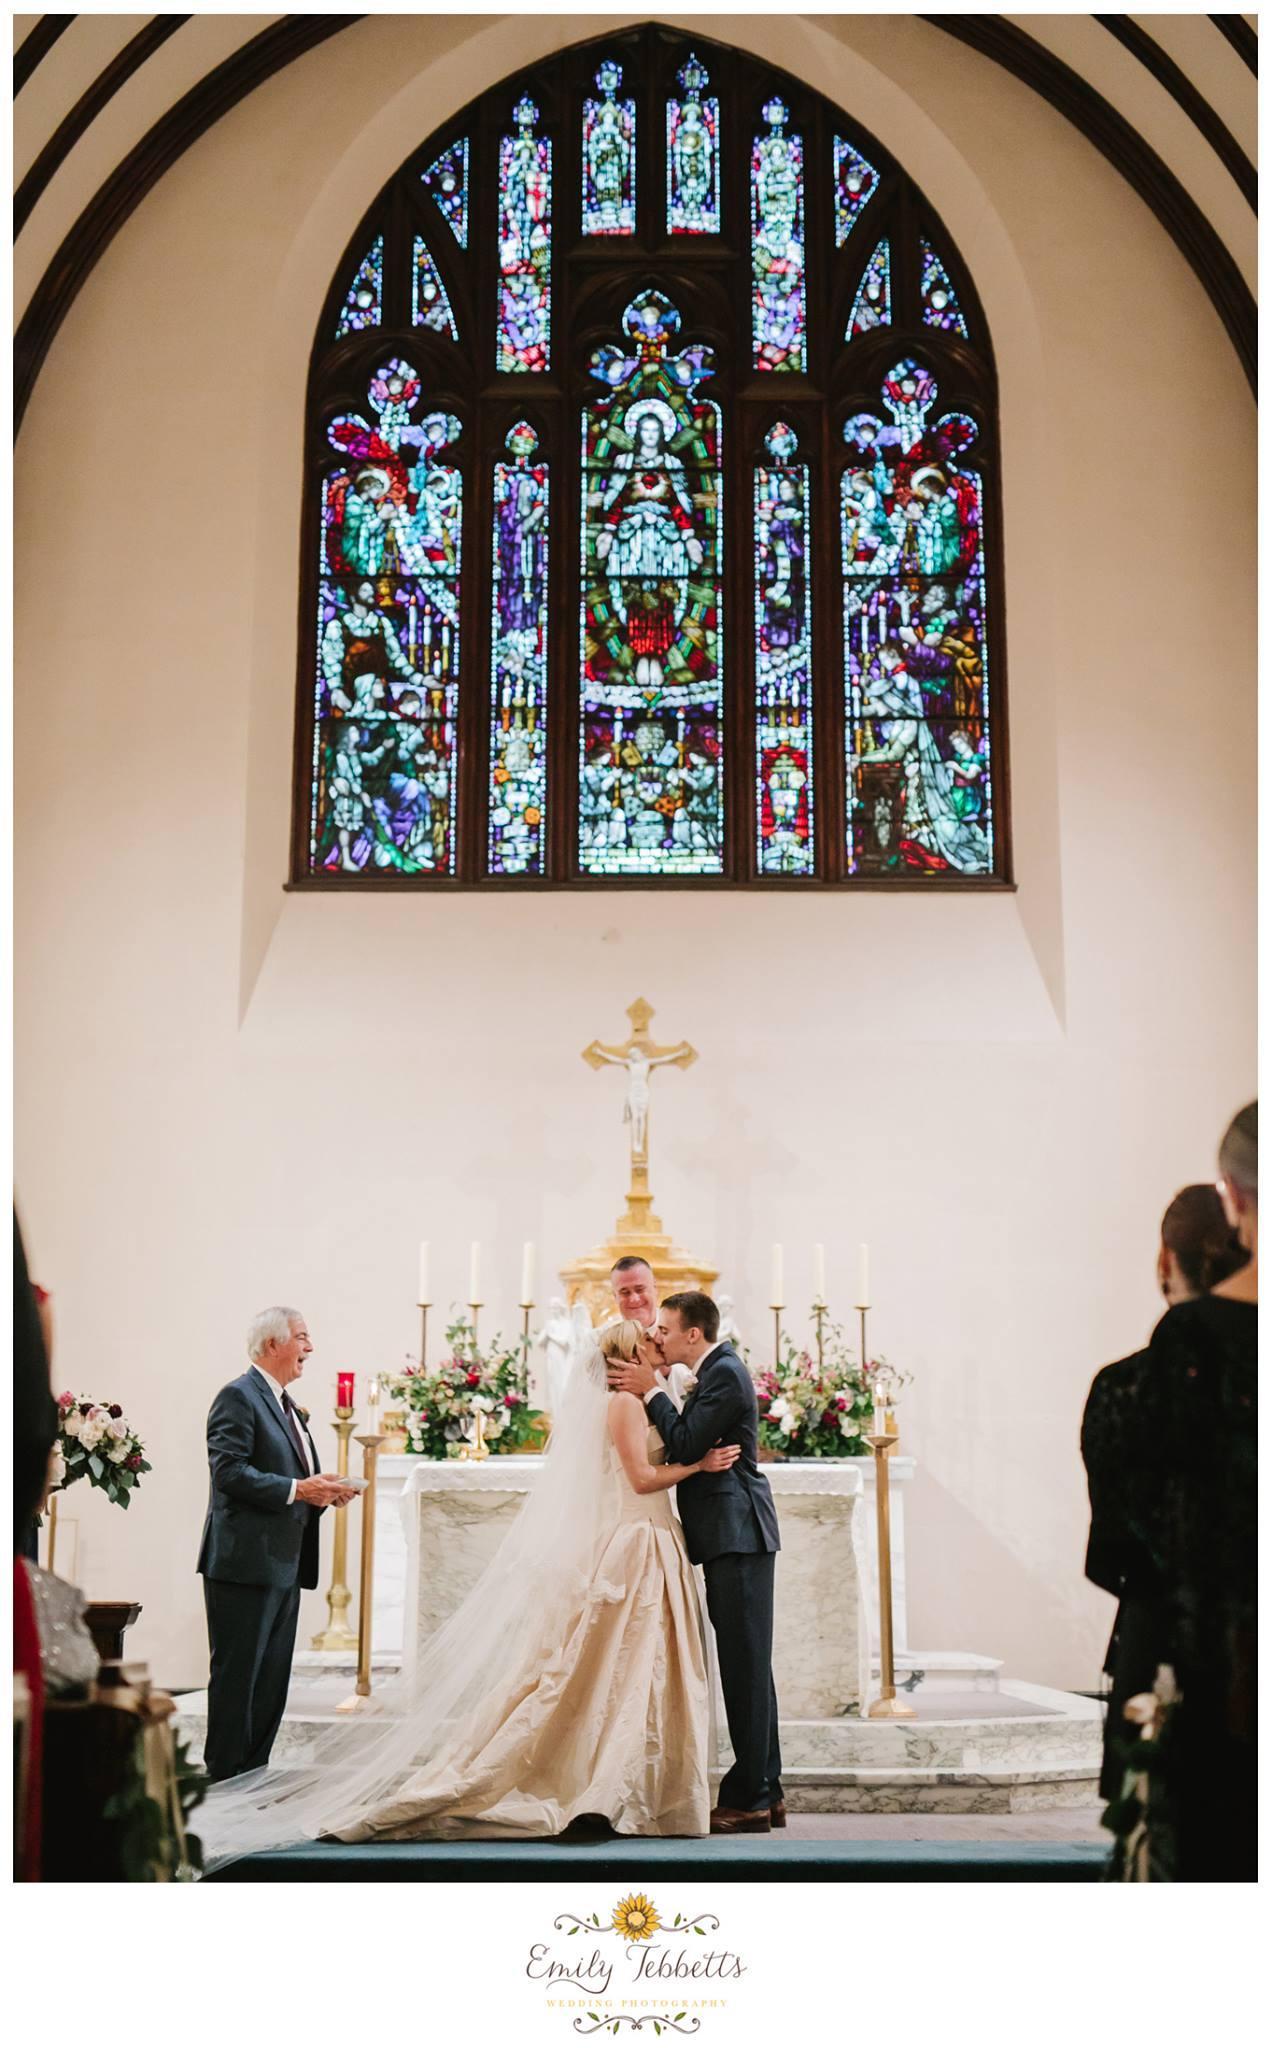 Crane Estate, Ipswich, MA - Emily Tebbetts Wedding Photography 6.jpg